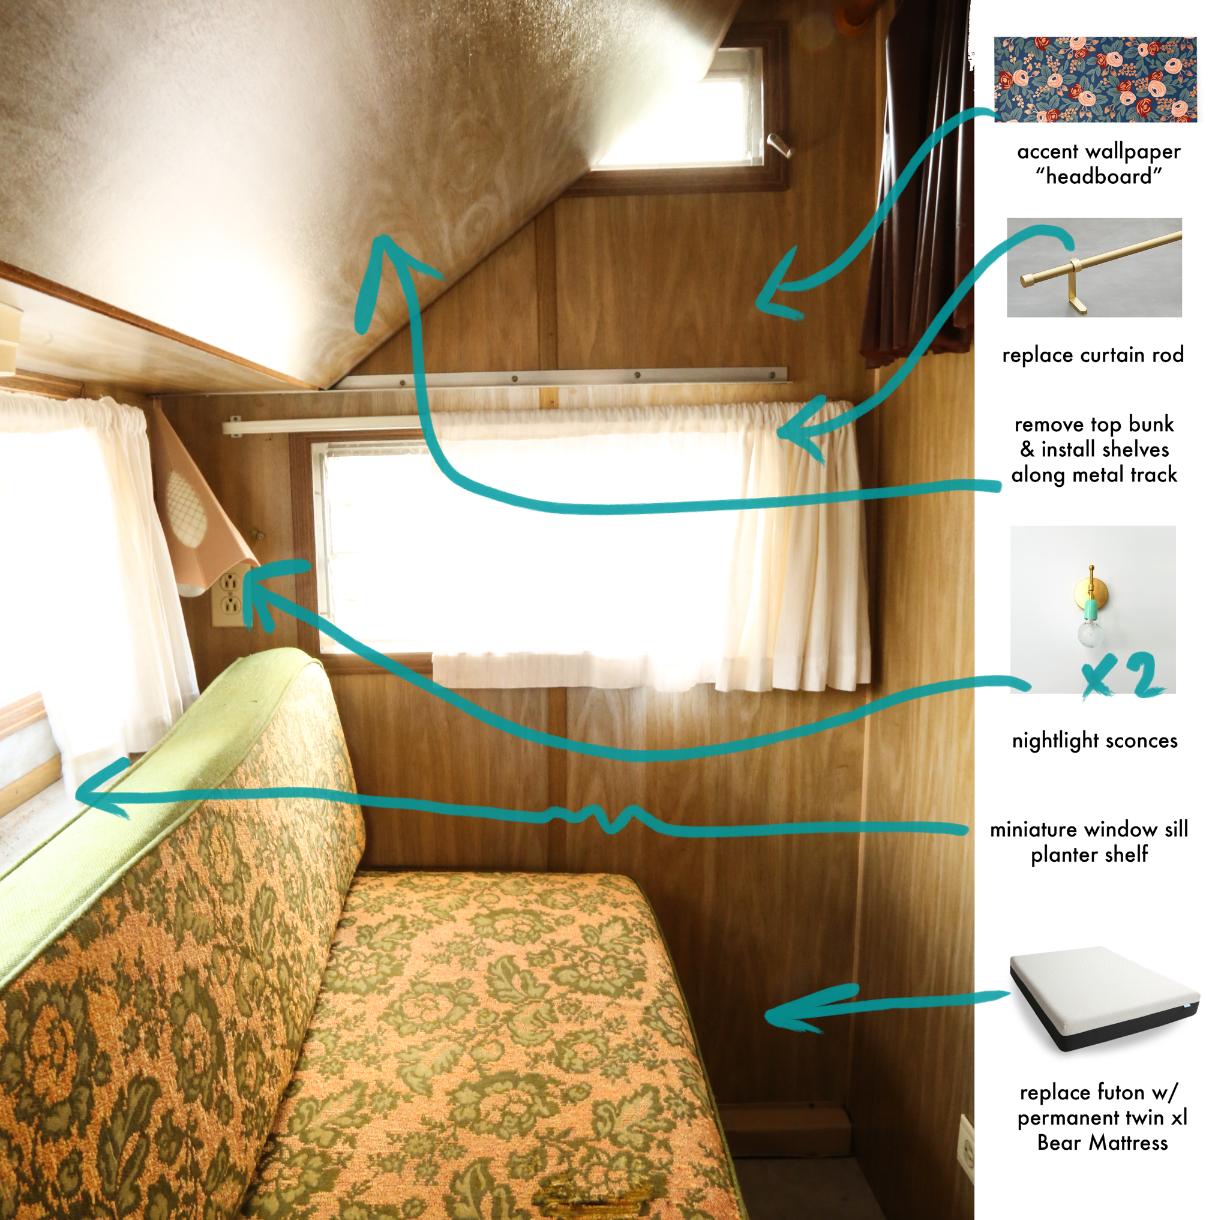 vintage trailer renovation plan, interior, bedroom